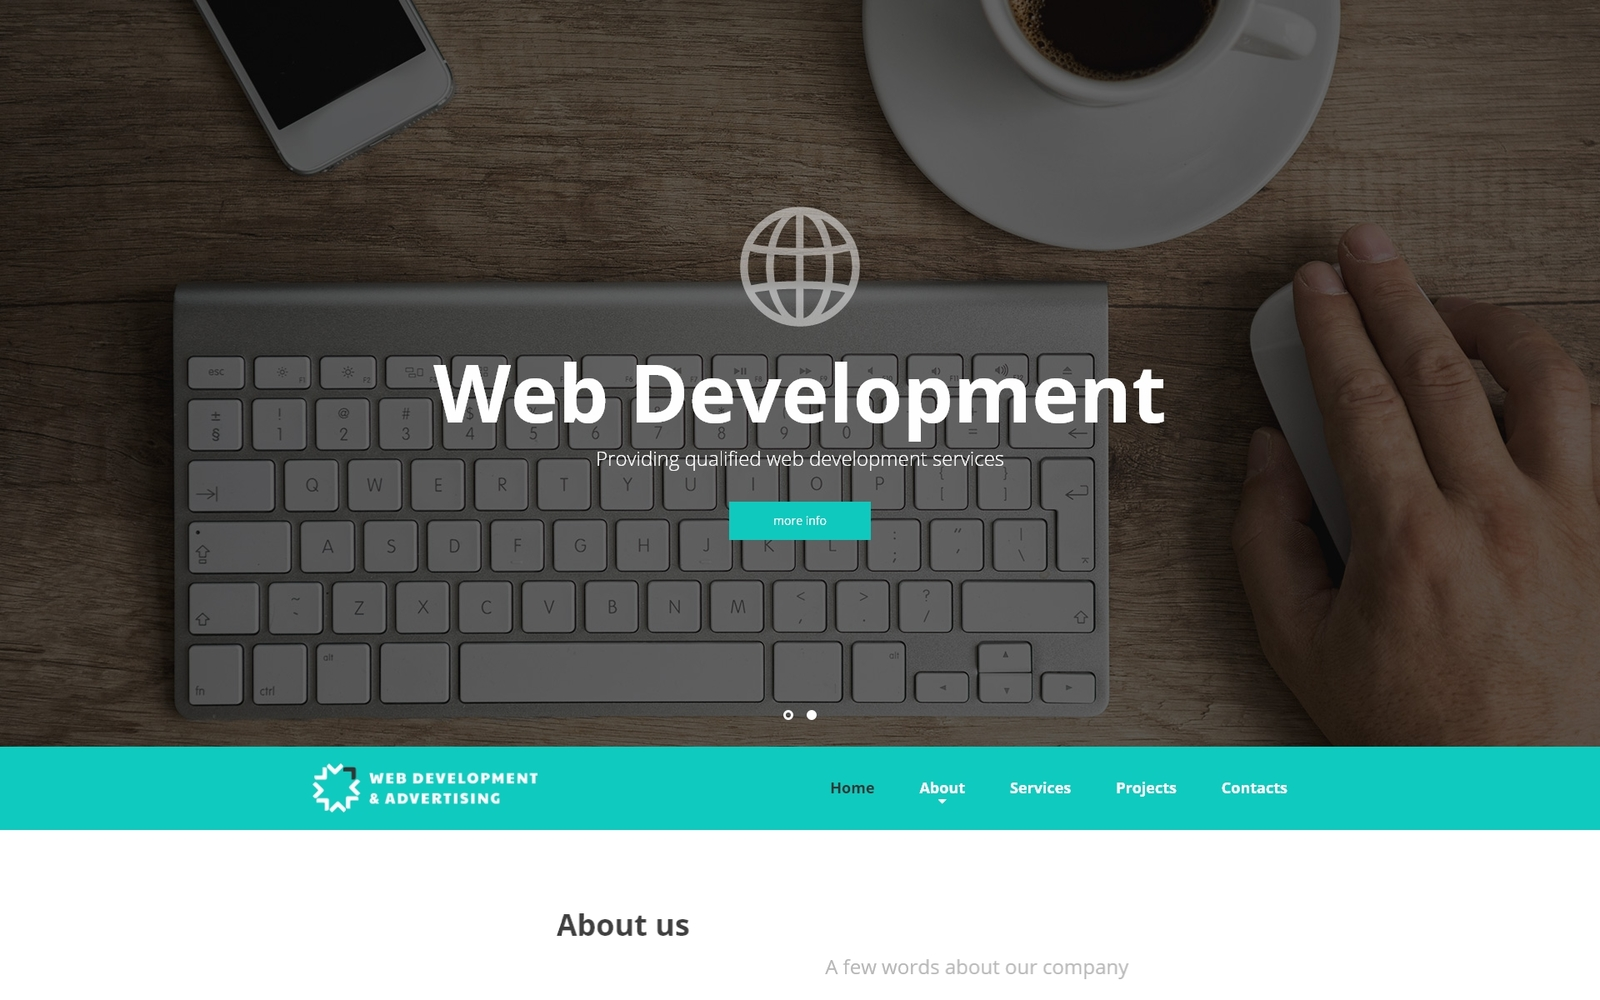 """Web Development & Advertising - Web Development Responsive"" 响应式网页模板 #52537"